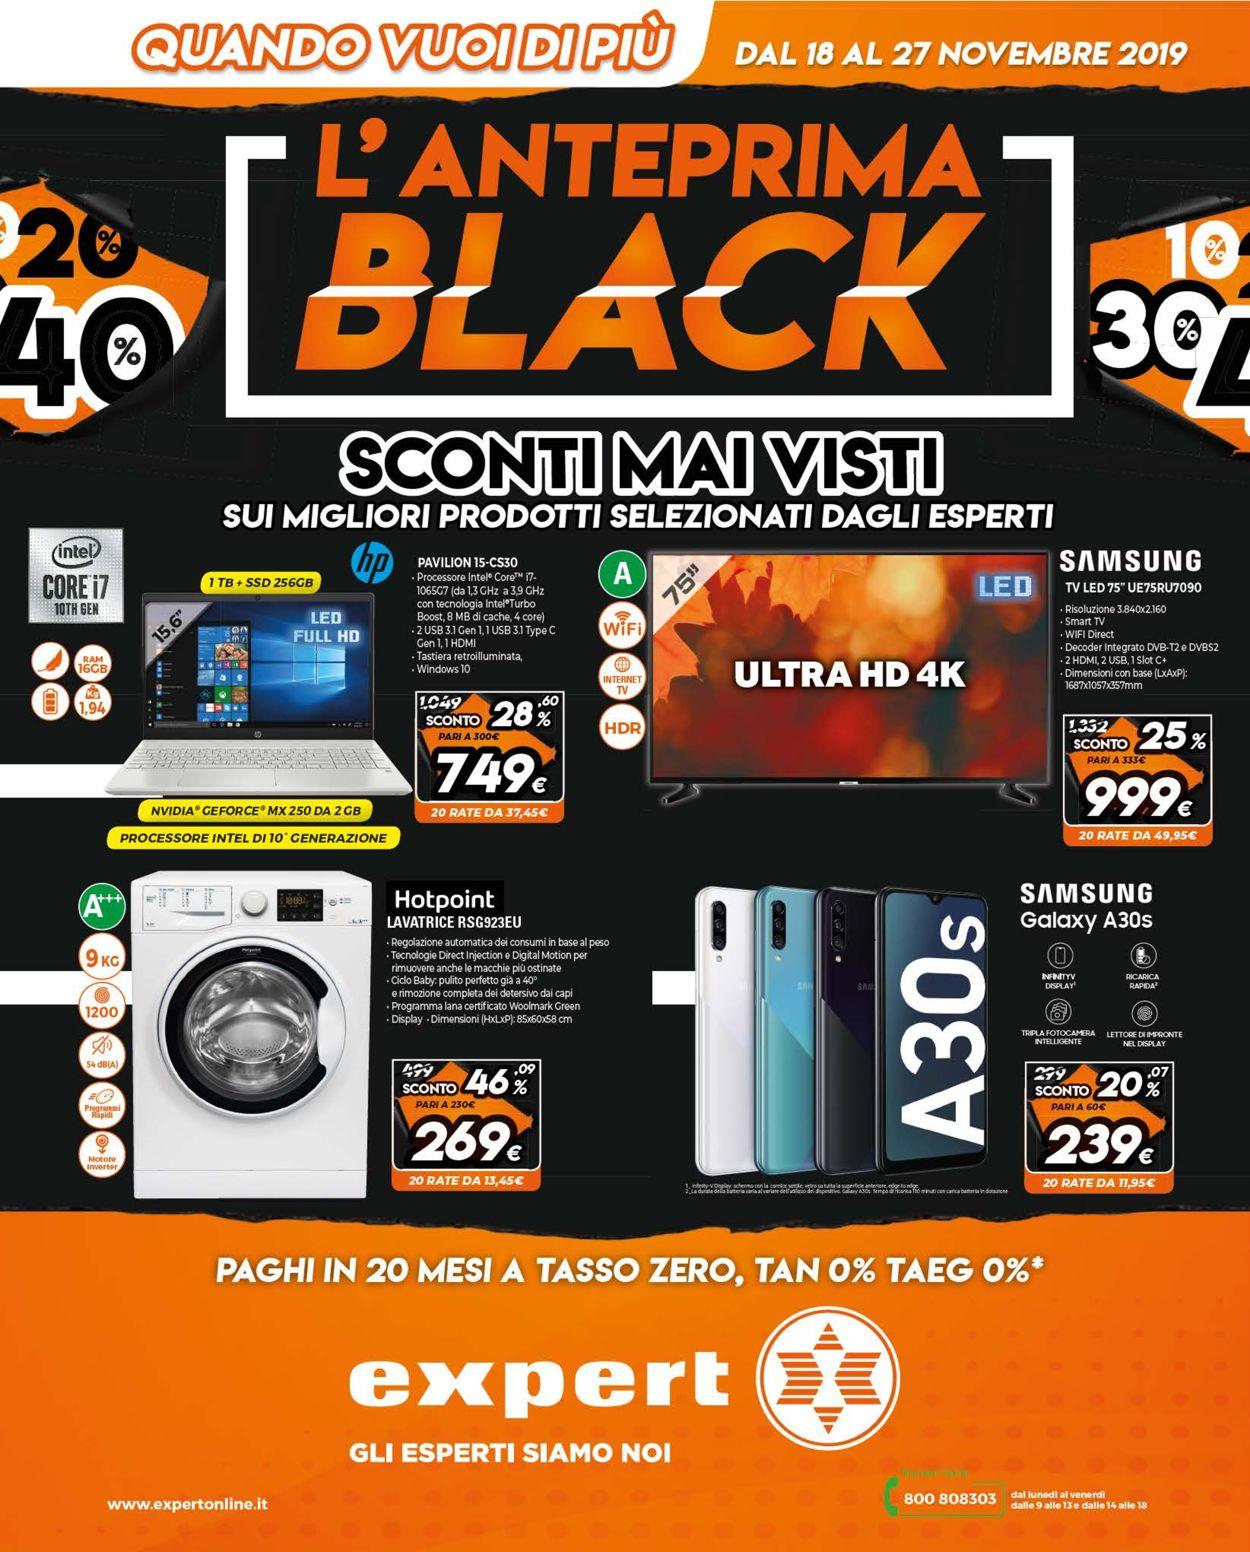 Volantino Expert L'ANTEPRIMA BLACK FRIDAY 2019 - Offerte 18/11-27/11/2019